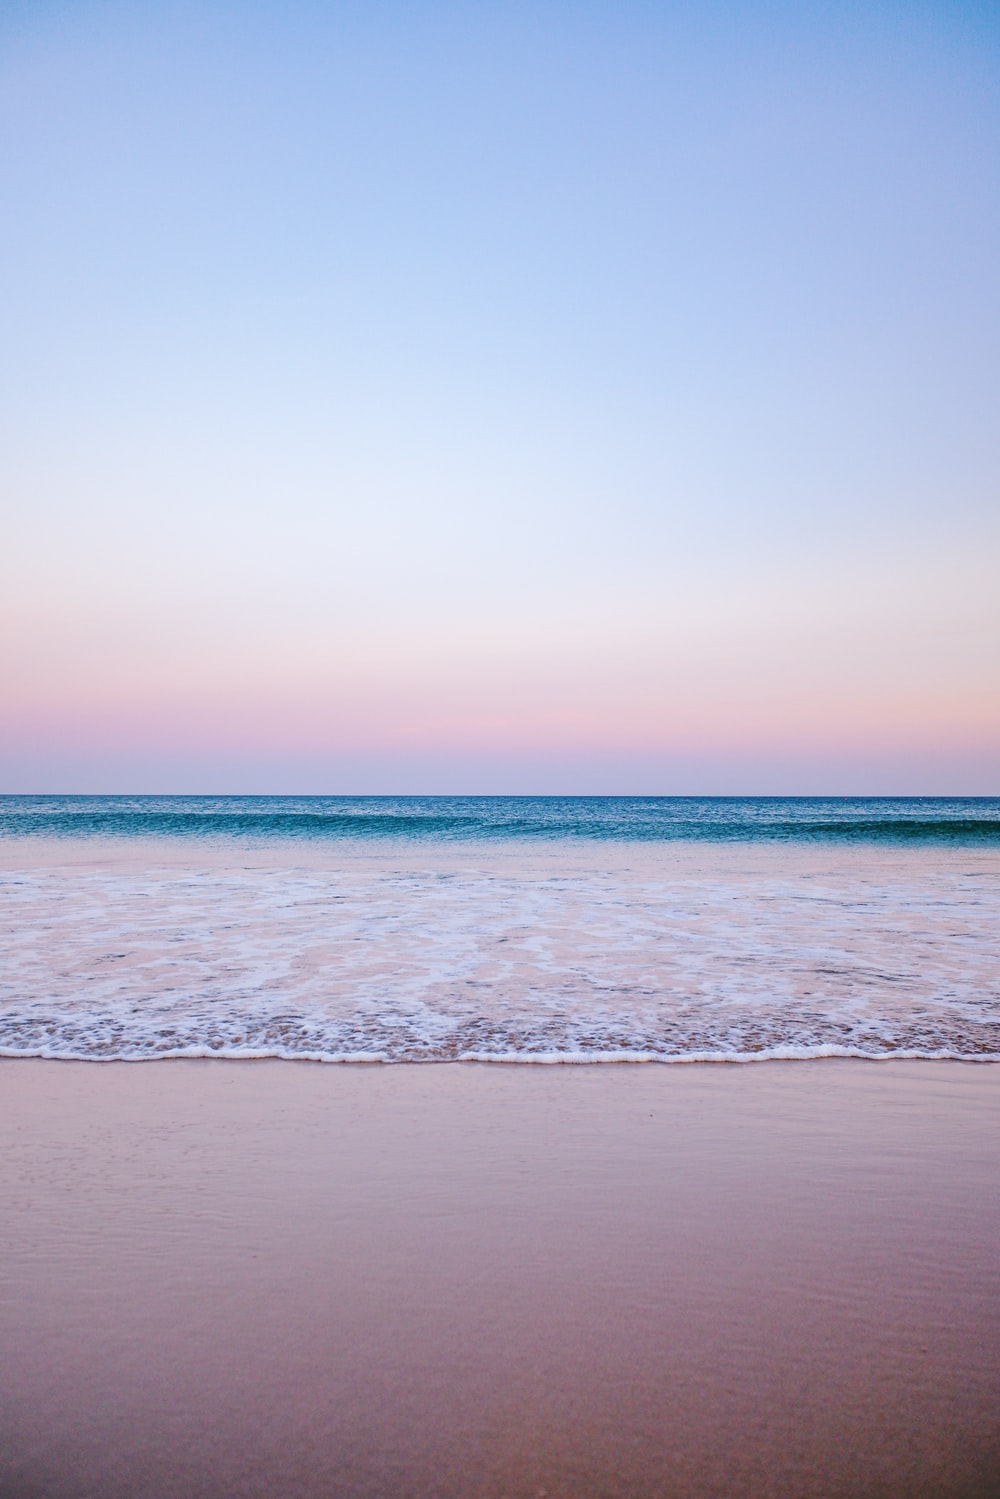 Pastel Sky Pictures Download Free Images On Unsplash